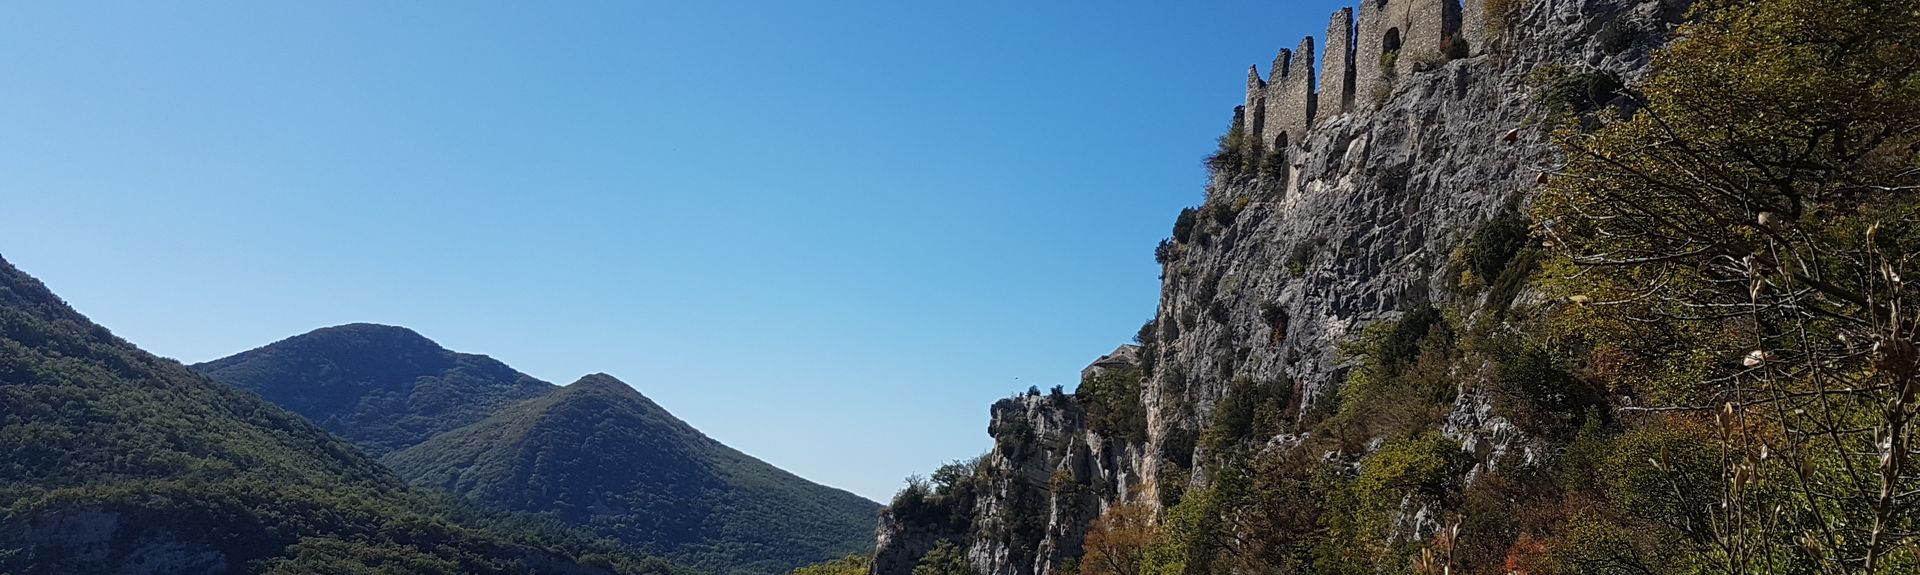 Saillans, Auvergne-Rhône-Alpes, Frankrike